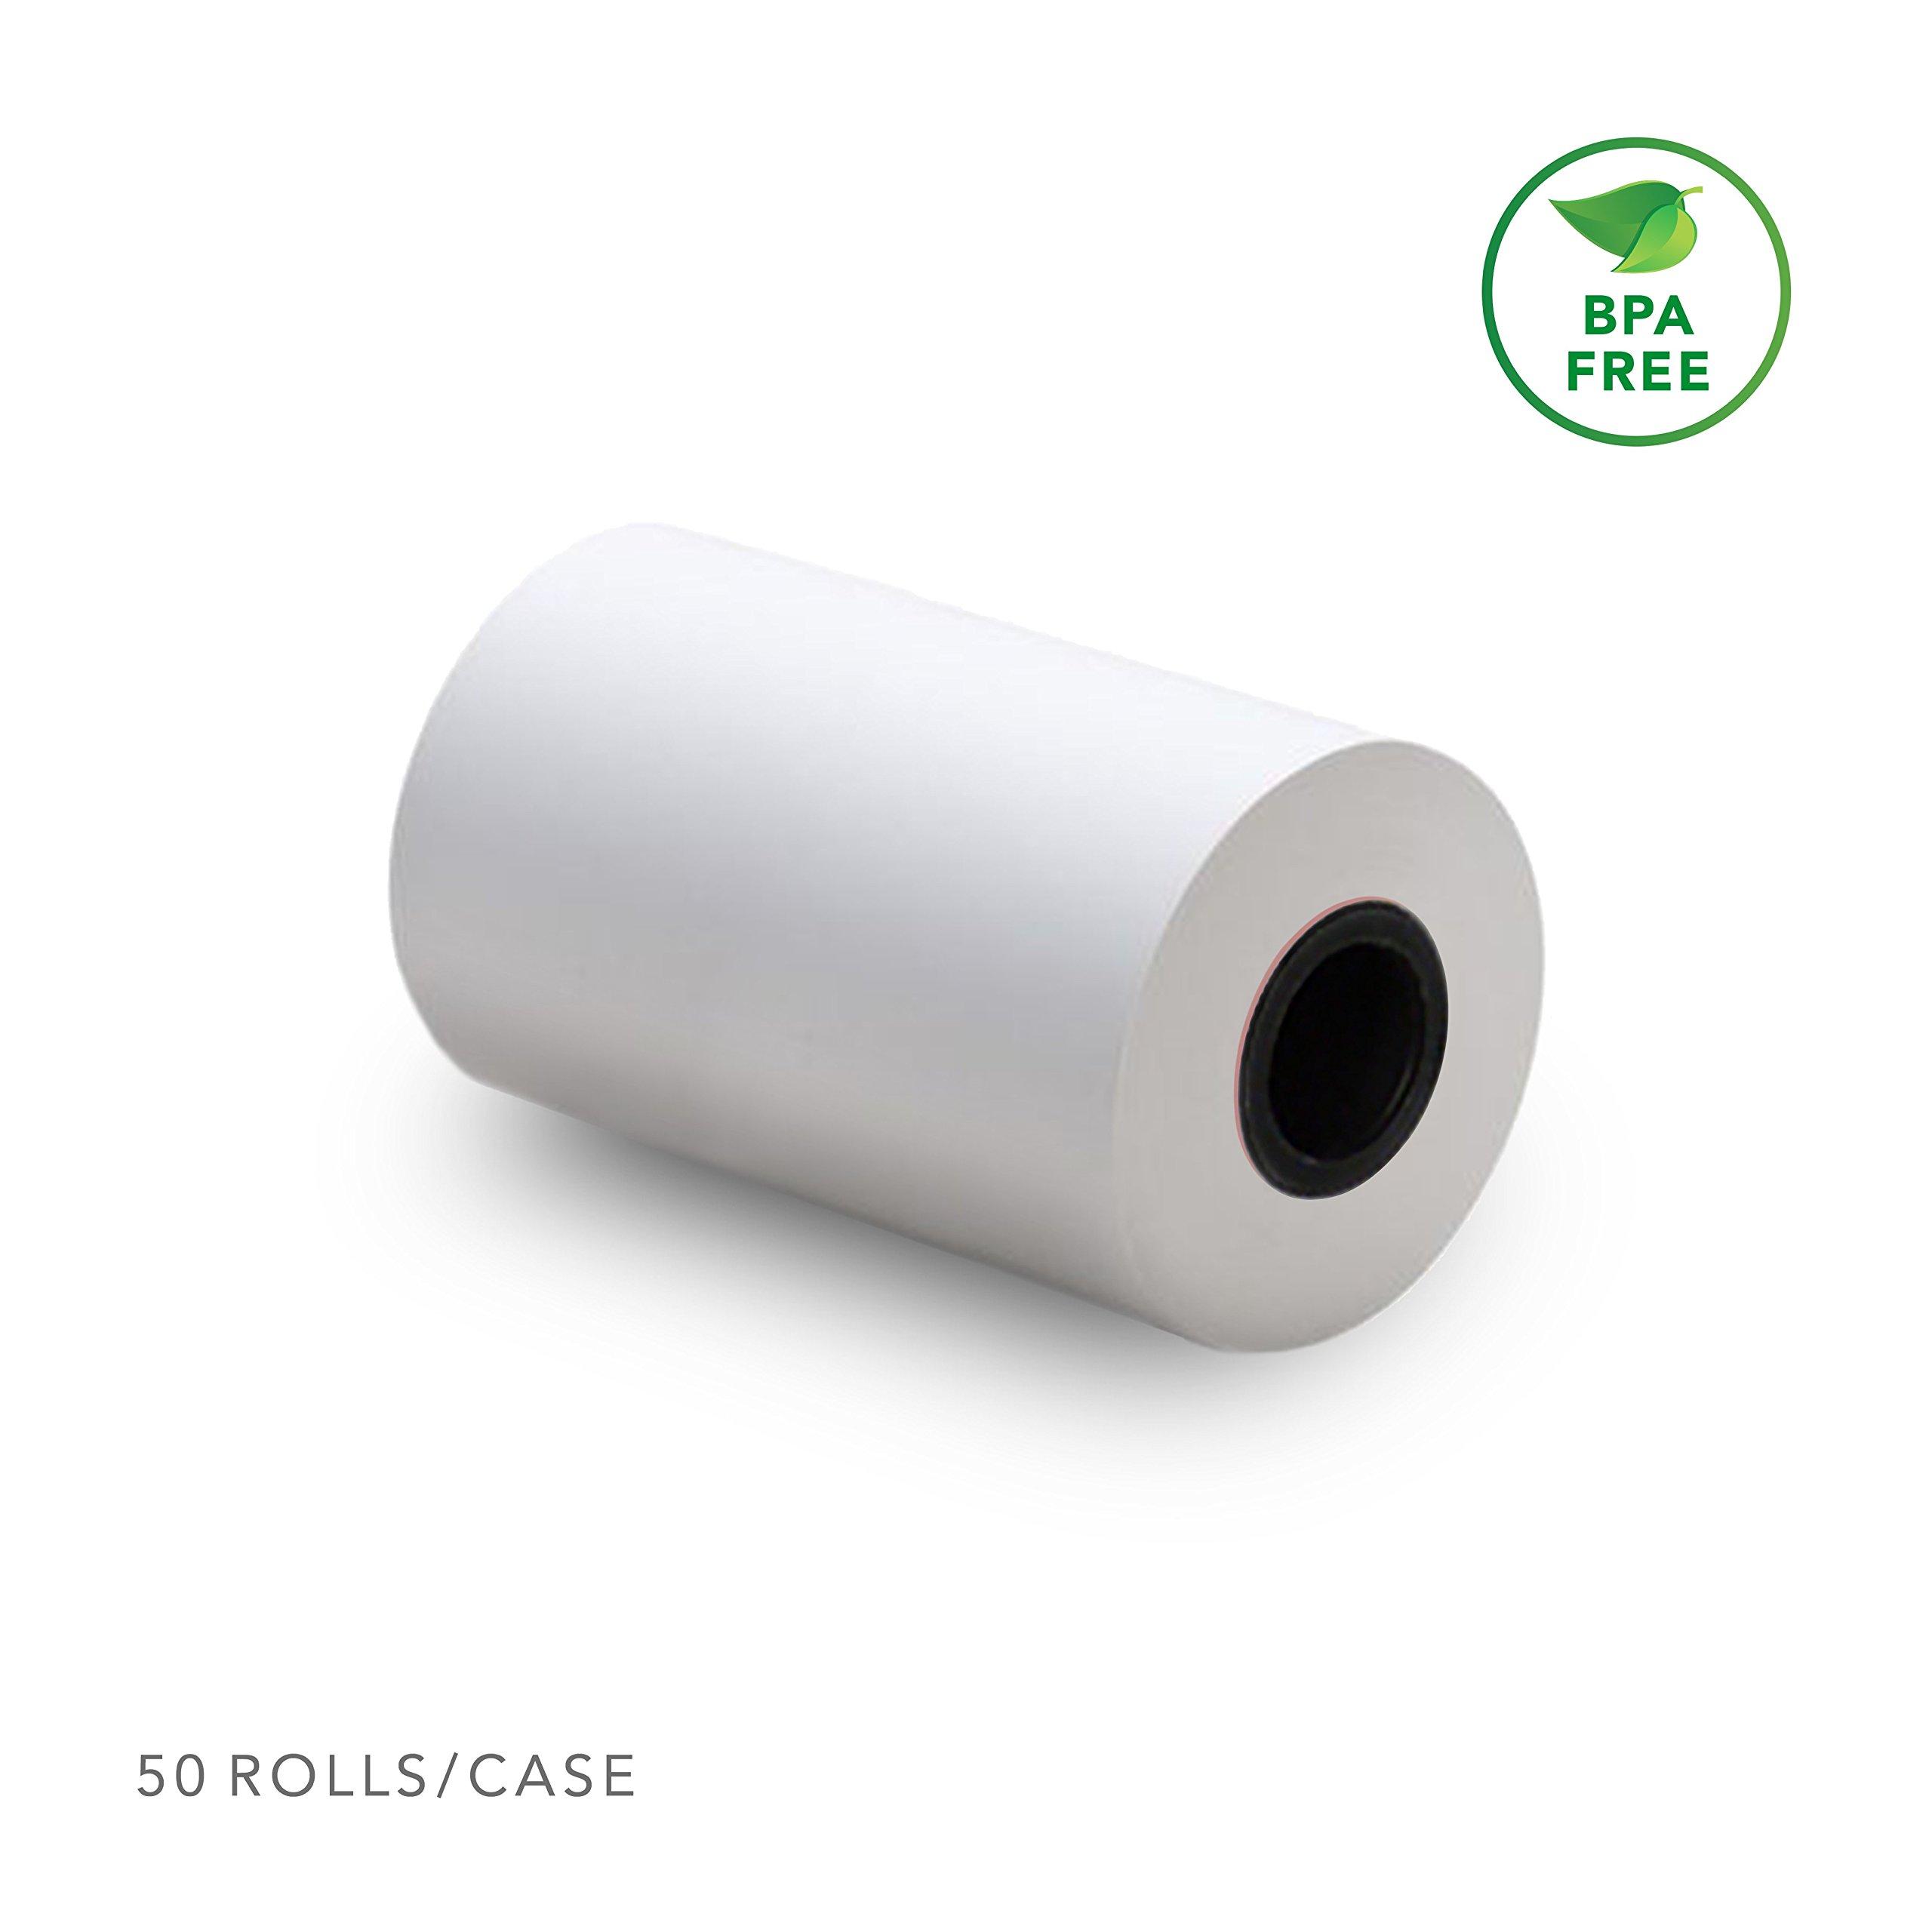 2 1/4'' X 50' (50 Rolls) BPA Free Thermal Receipt Paper Roll for Verifone VX520 VX670 VX680 VX690, Clover Flex, Ingenico iCT220 iCT250 by EXQUIS Supply & Co.